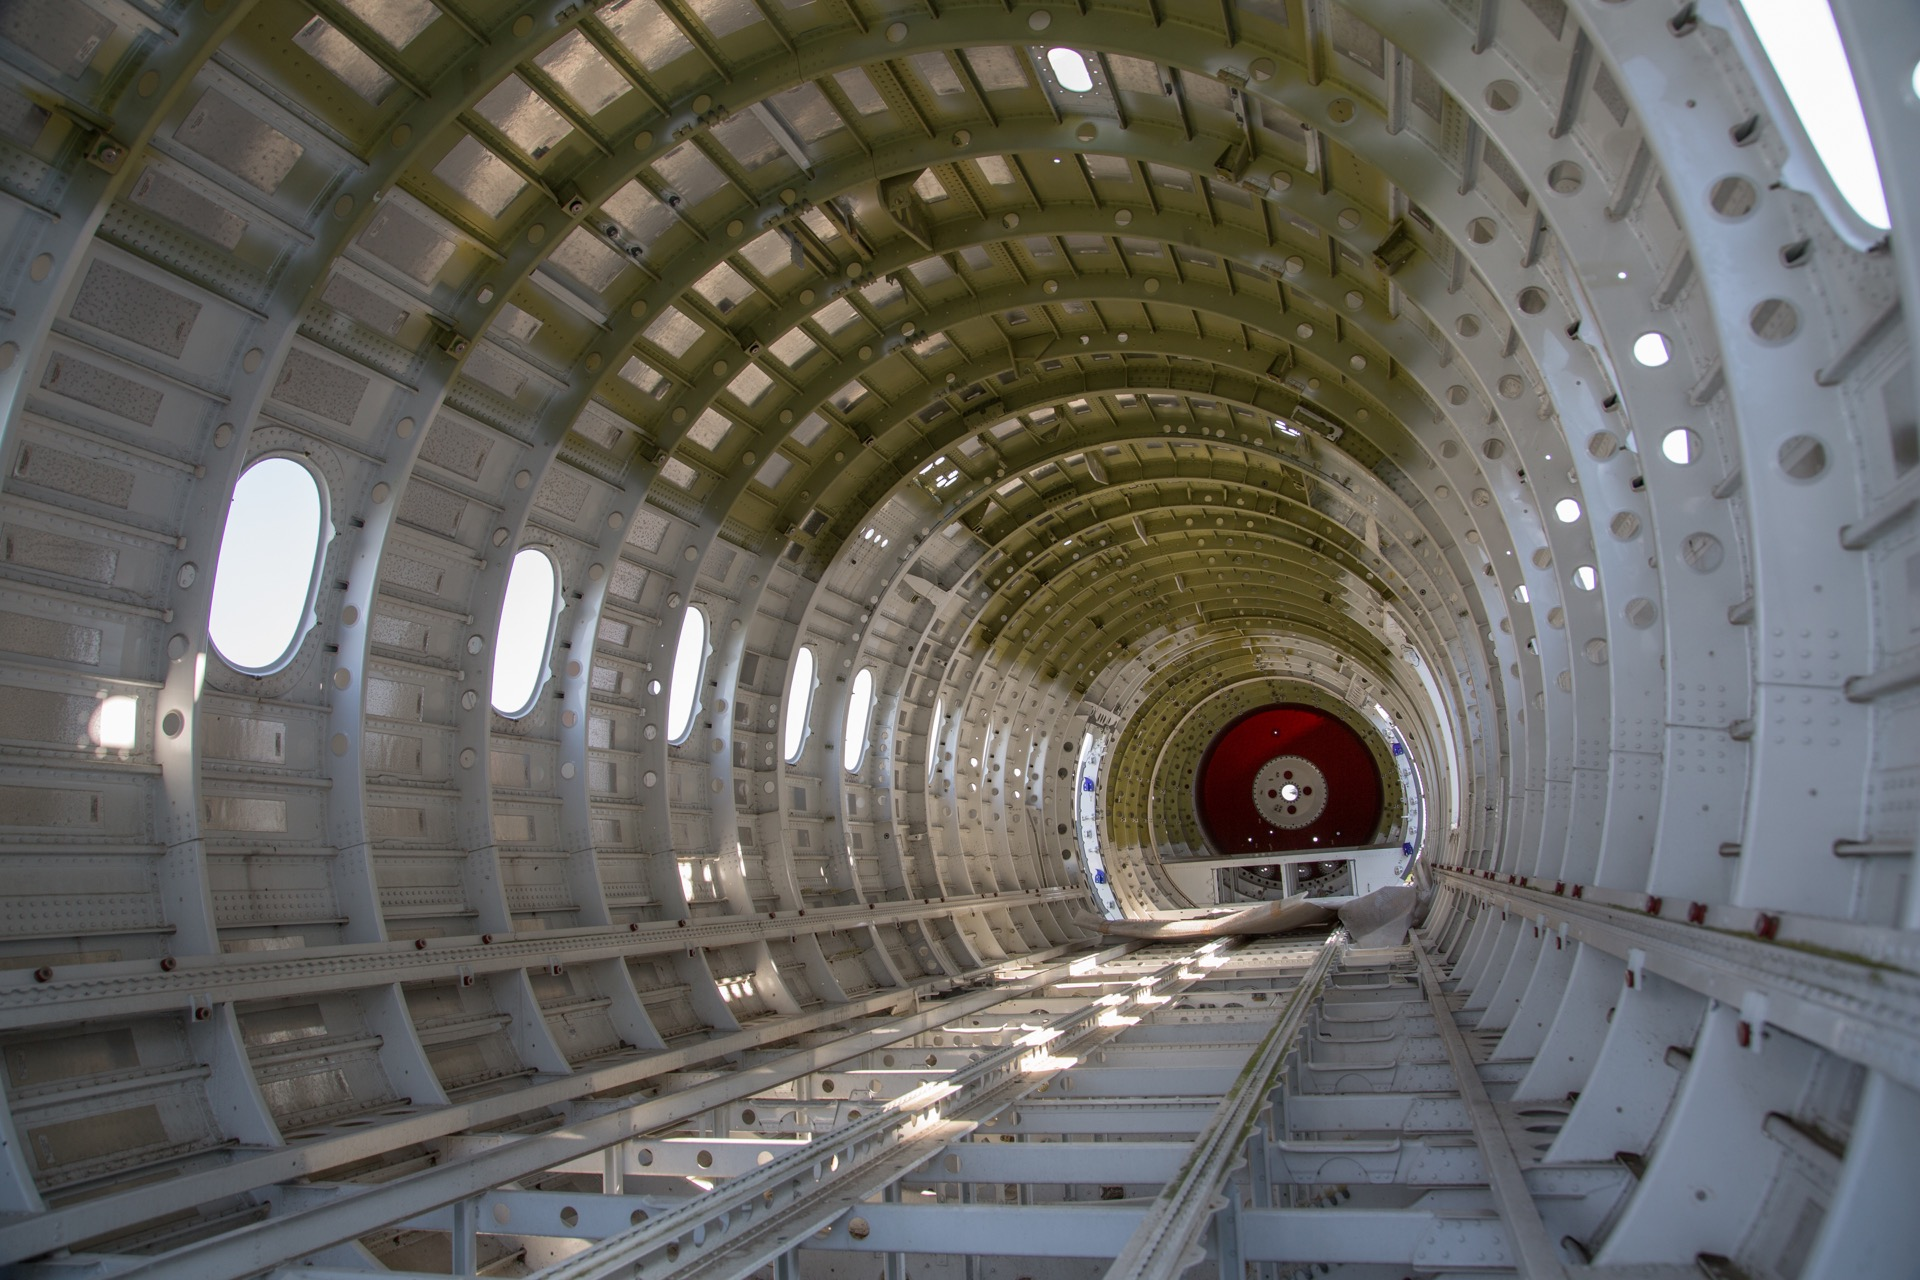 Aluminum aircraft fuselage